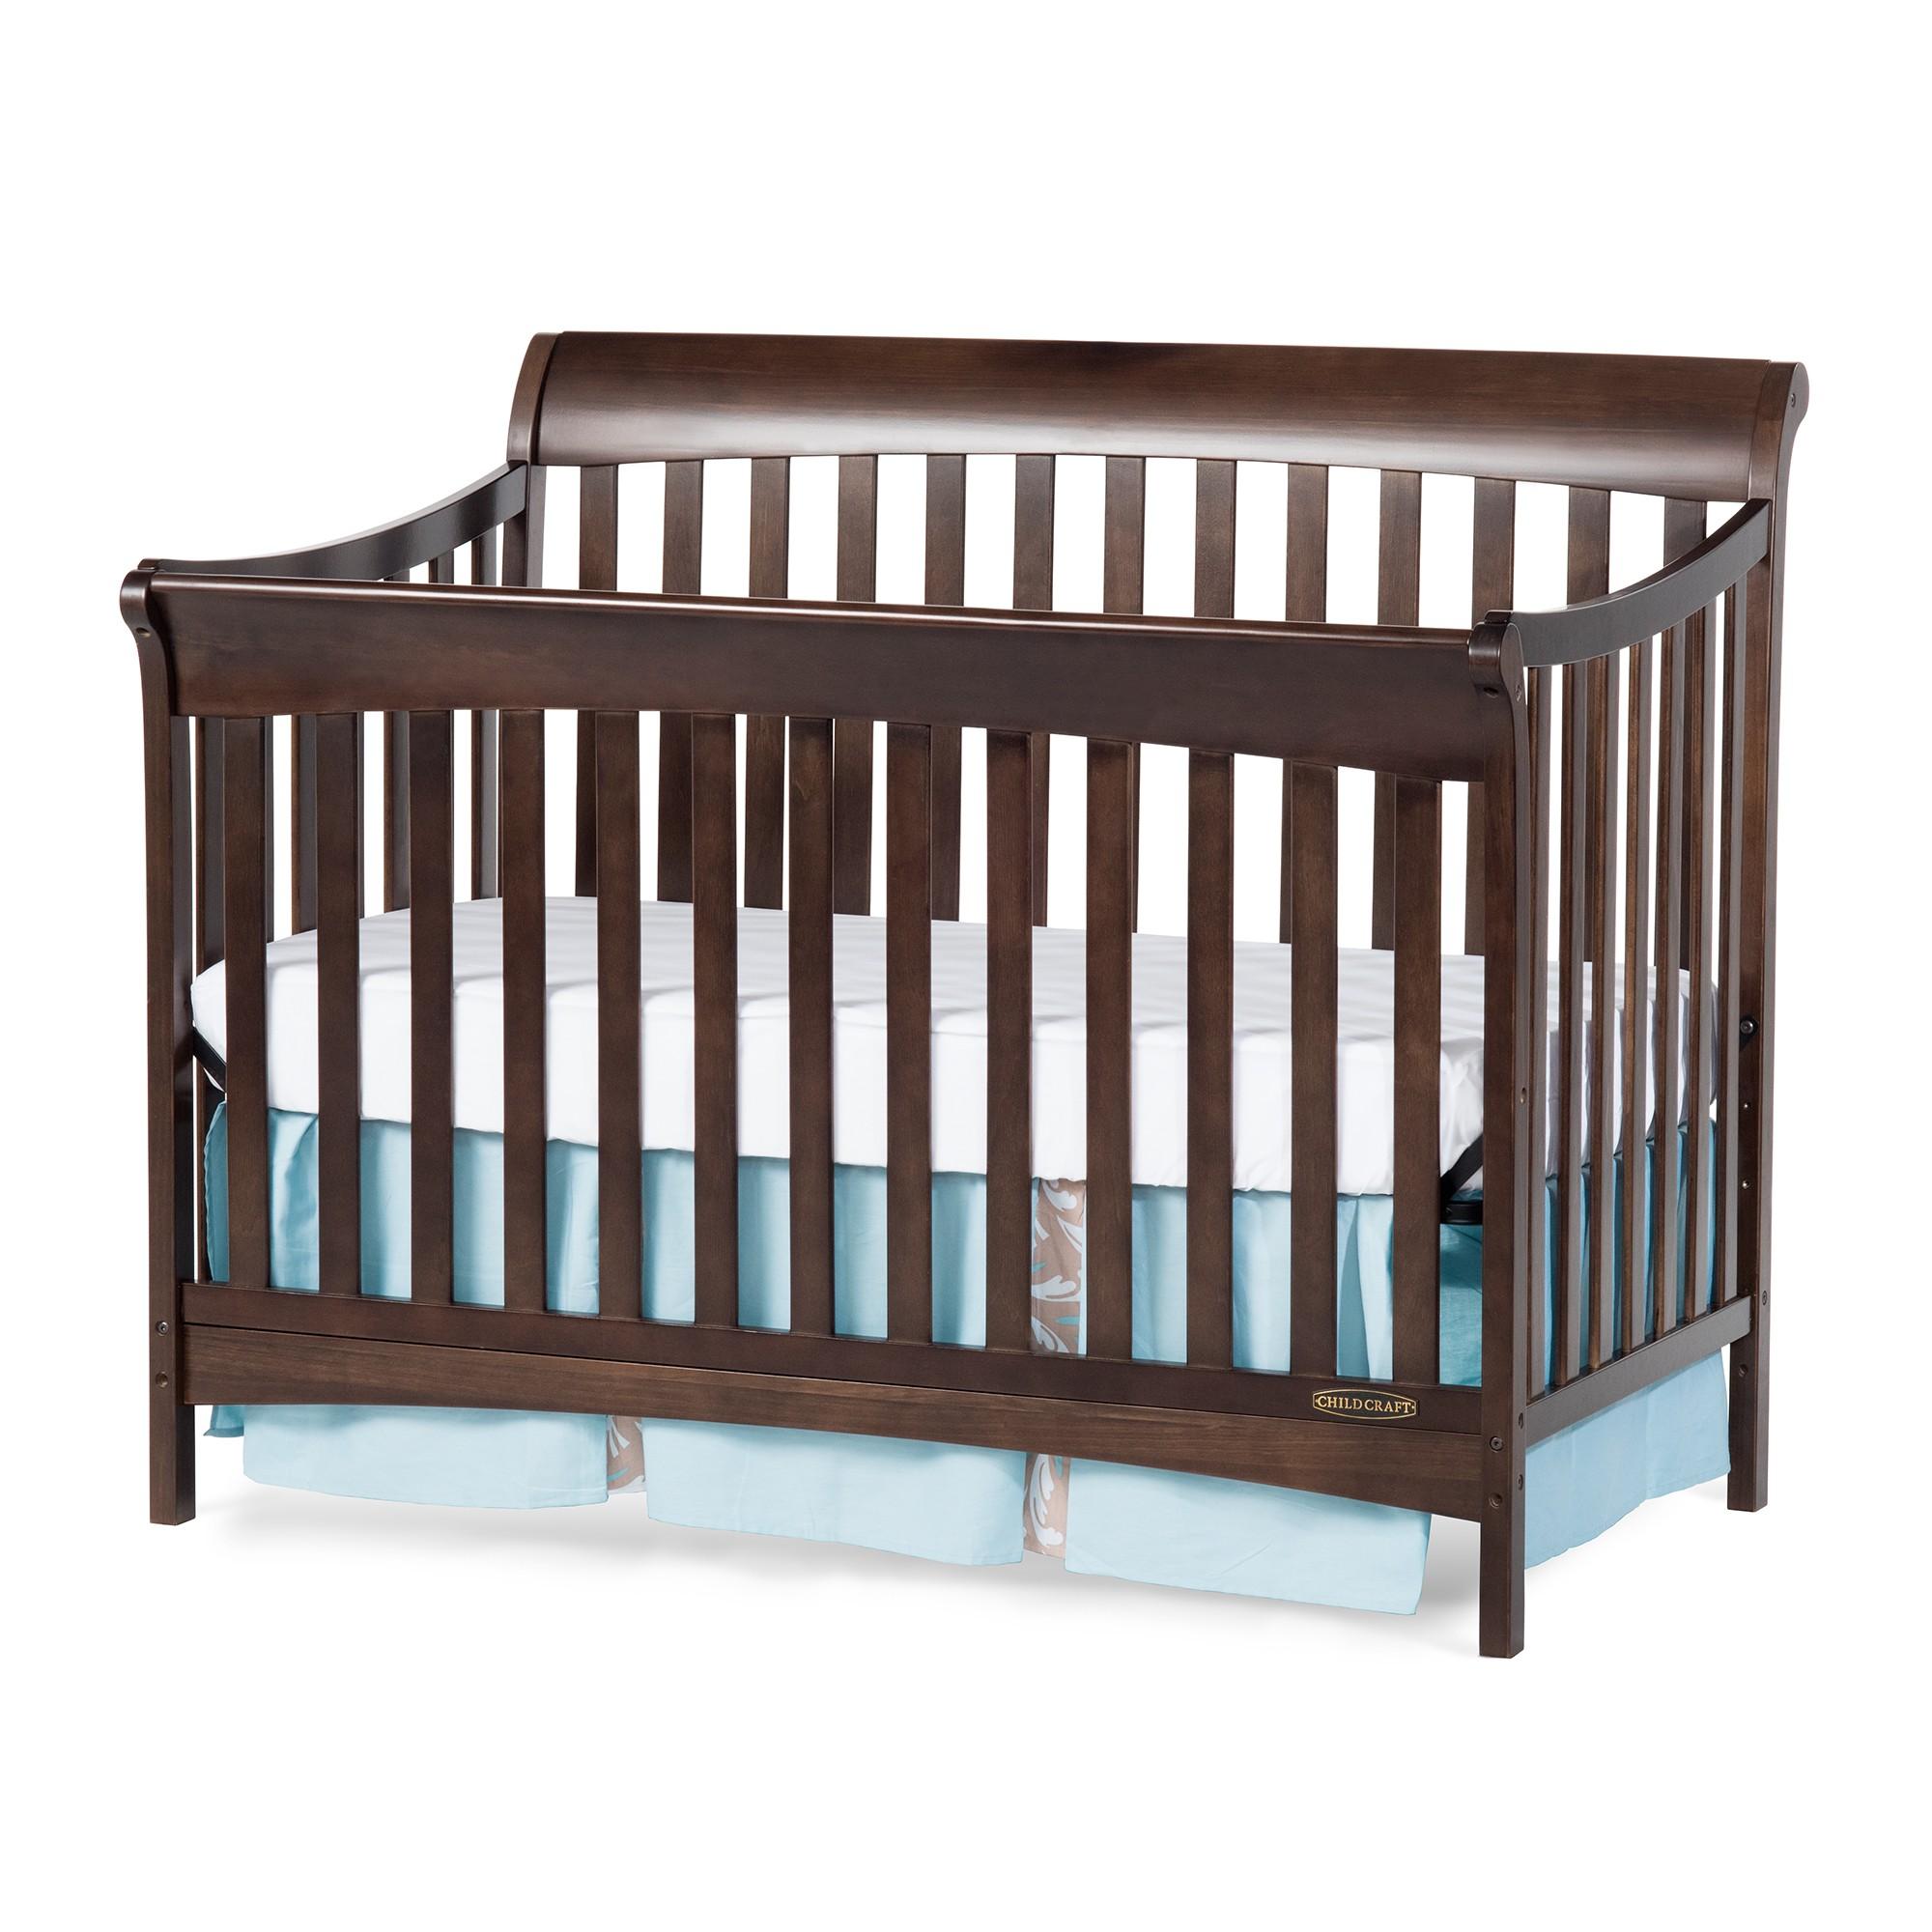 Child craft coventry crib - Child Craft Coventry Crib 19